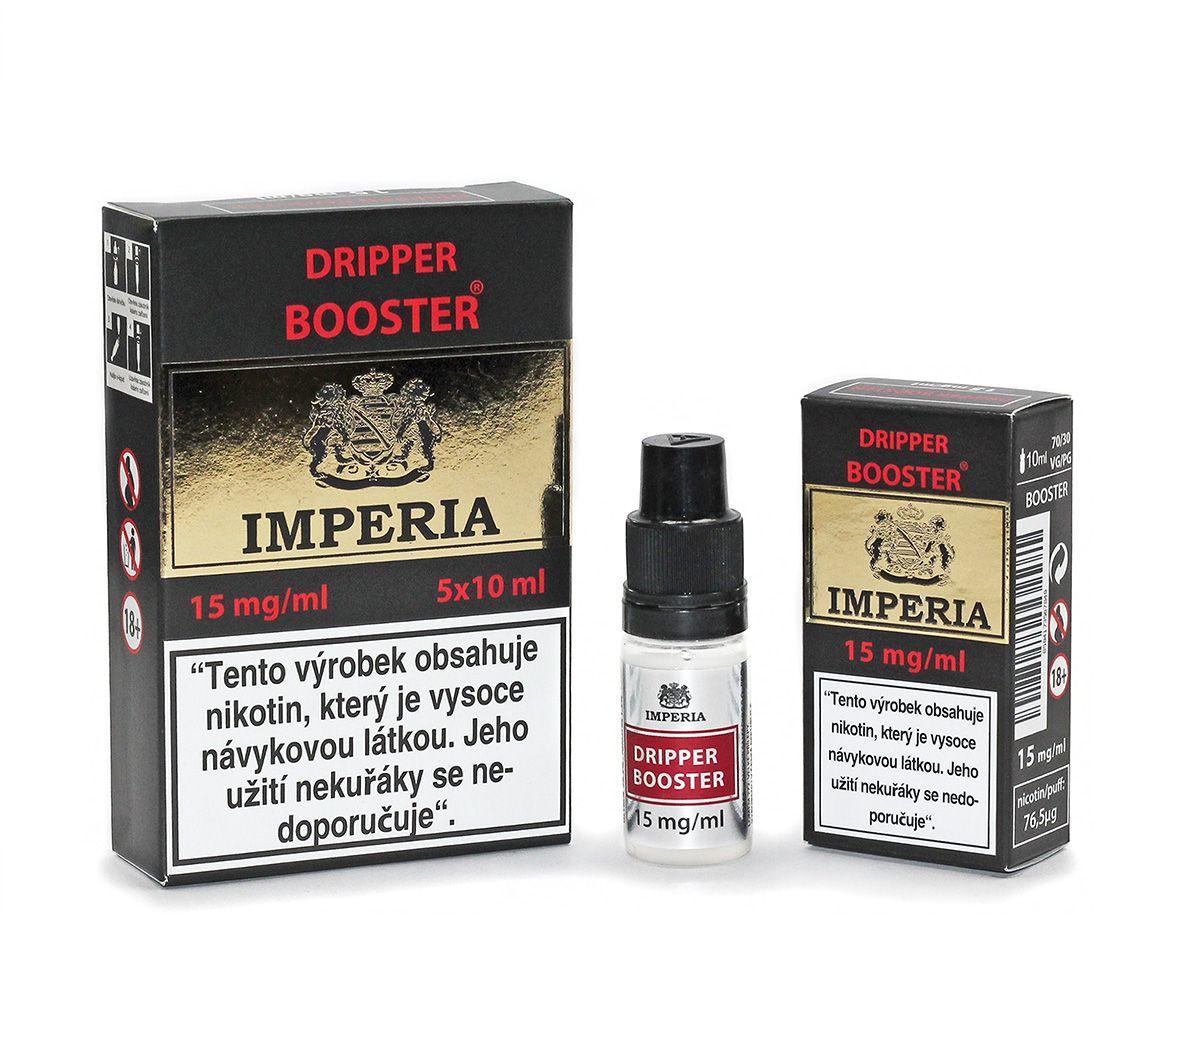 IMPERIA Dripper Booster 15mg - 5x10ml (30PG/70VG)